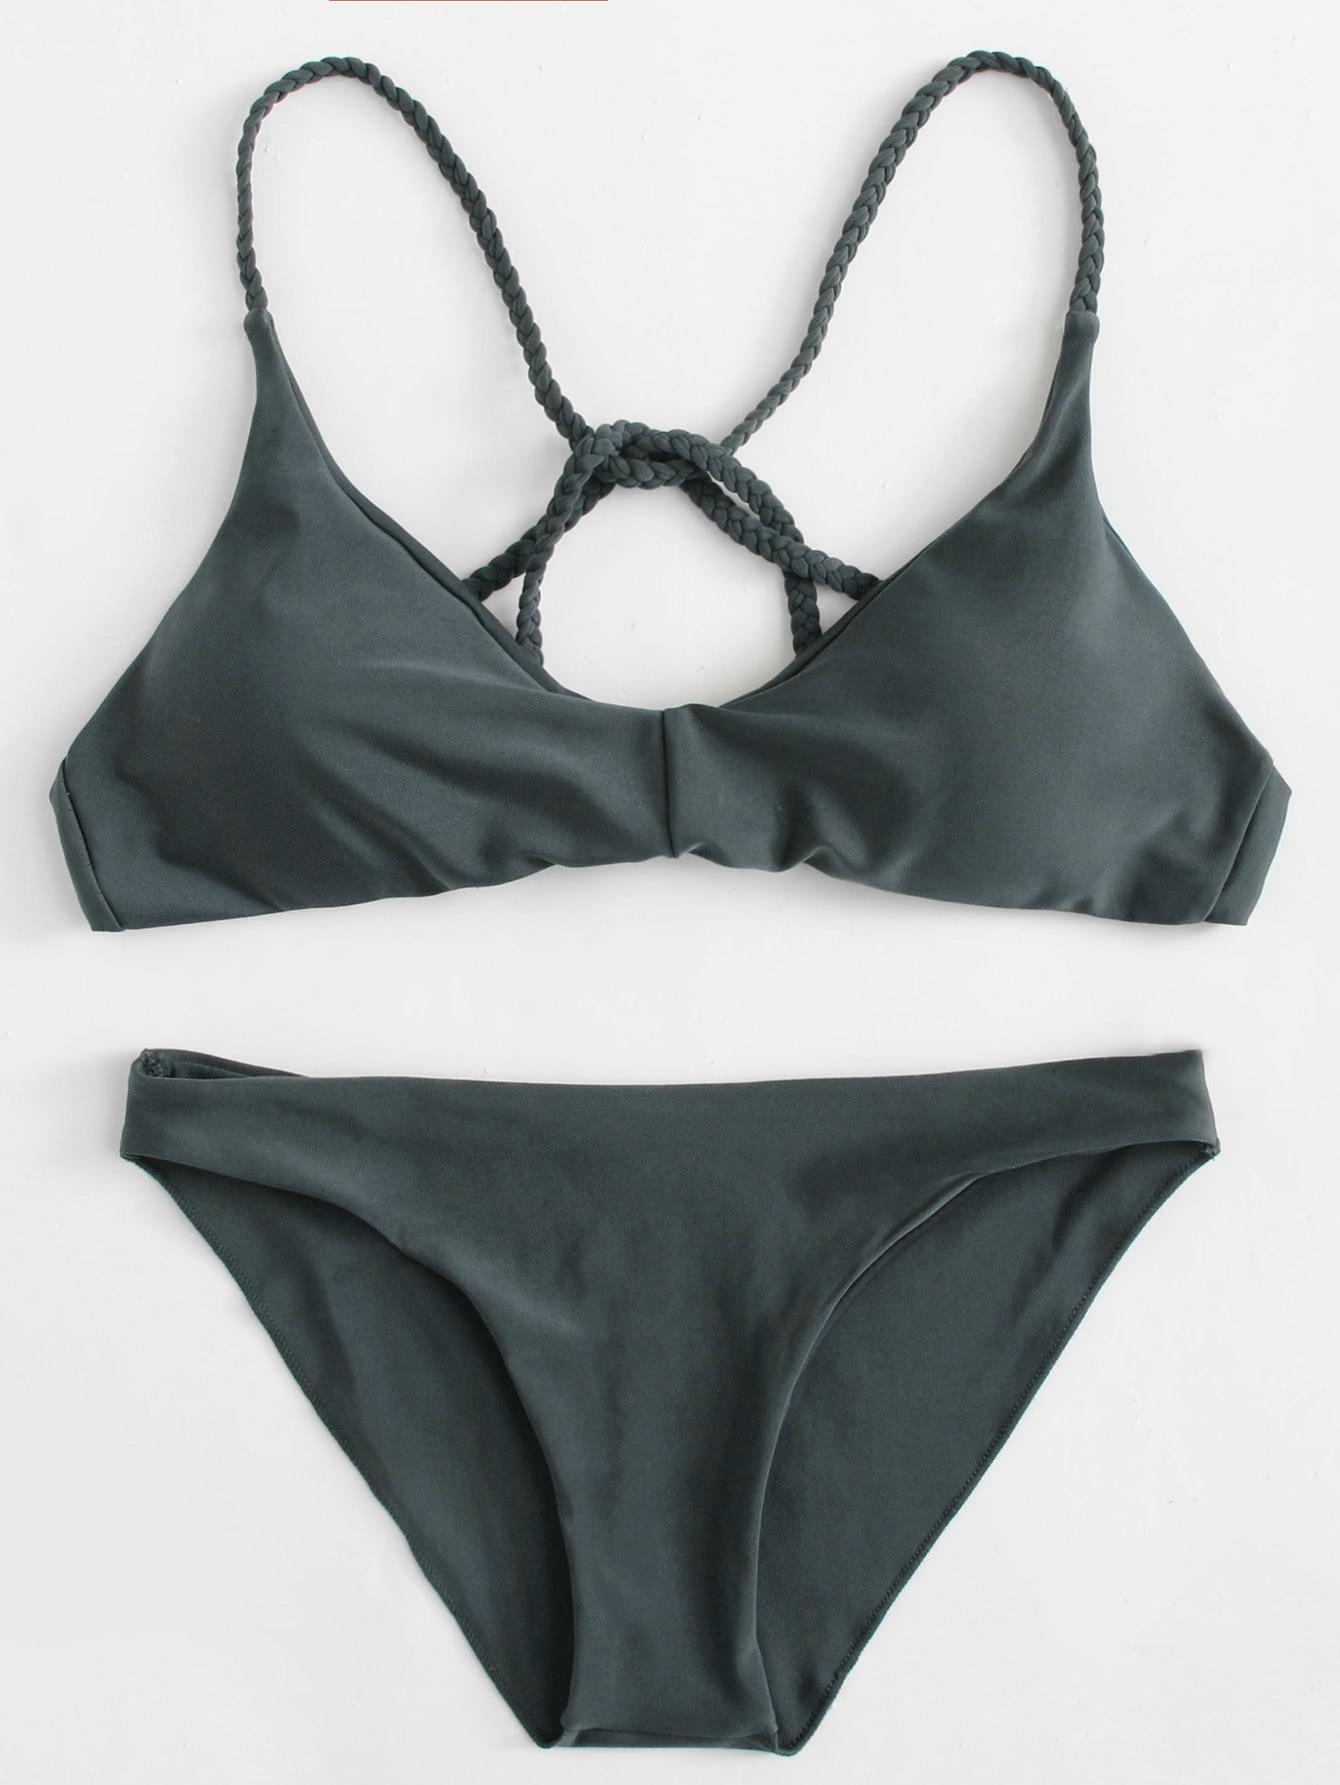 Braided Strap Beach Bikini Set все цены